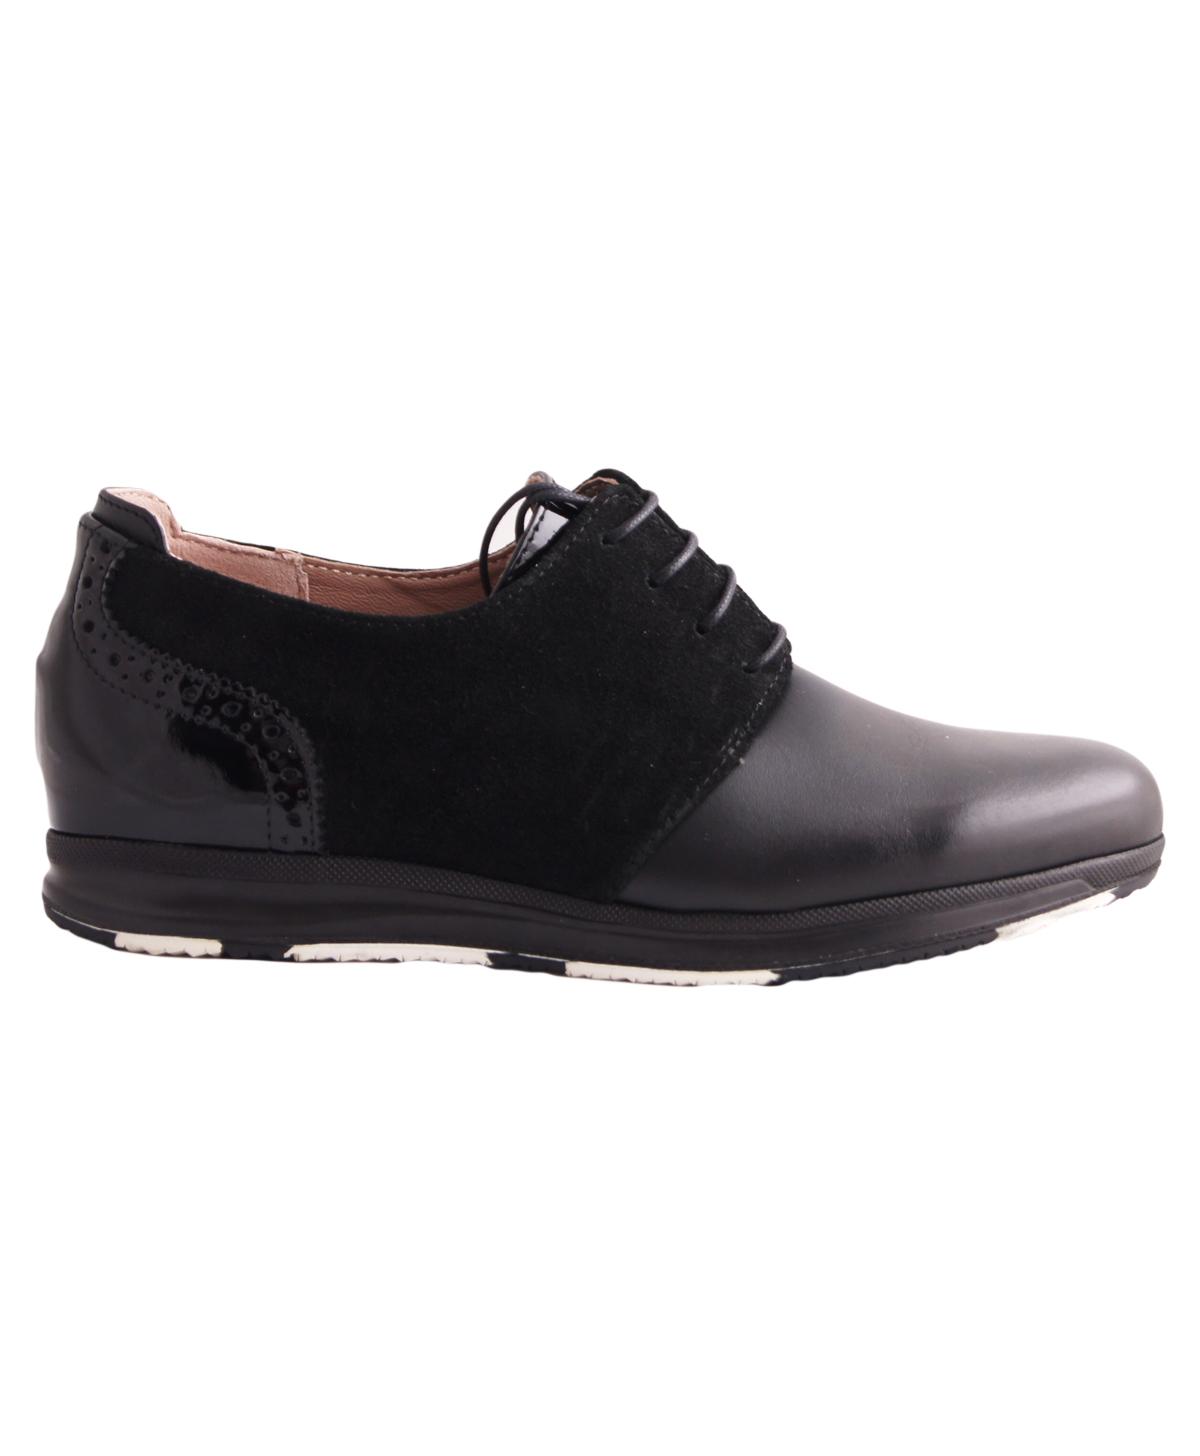 626d95f1190 Дамски обувки естествена кожа 08-190-5 ≫ ТОП цена | Annamoda.eu